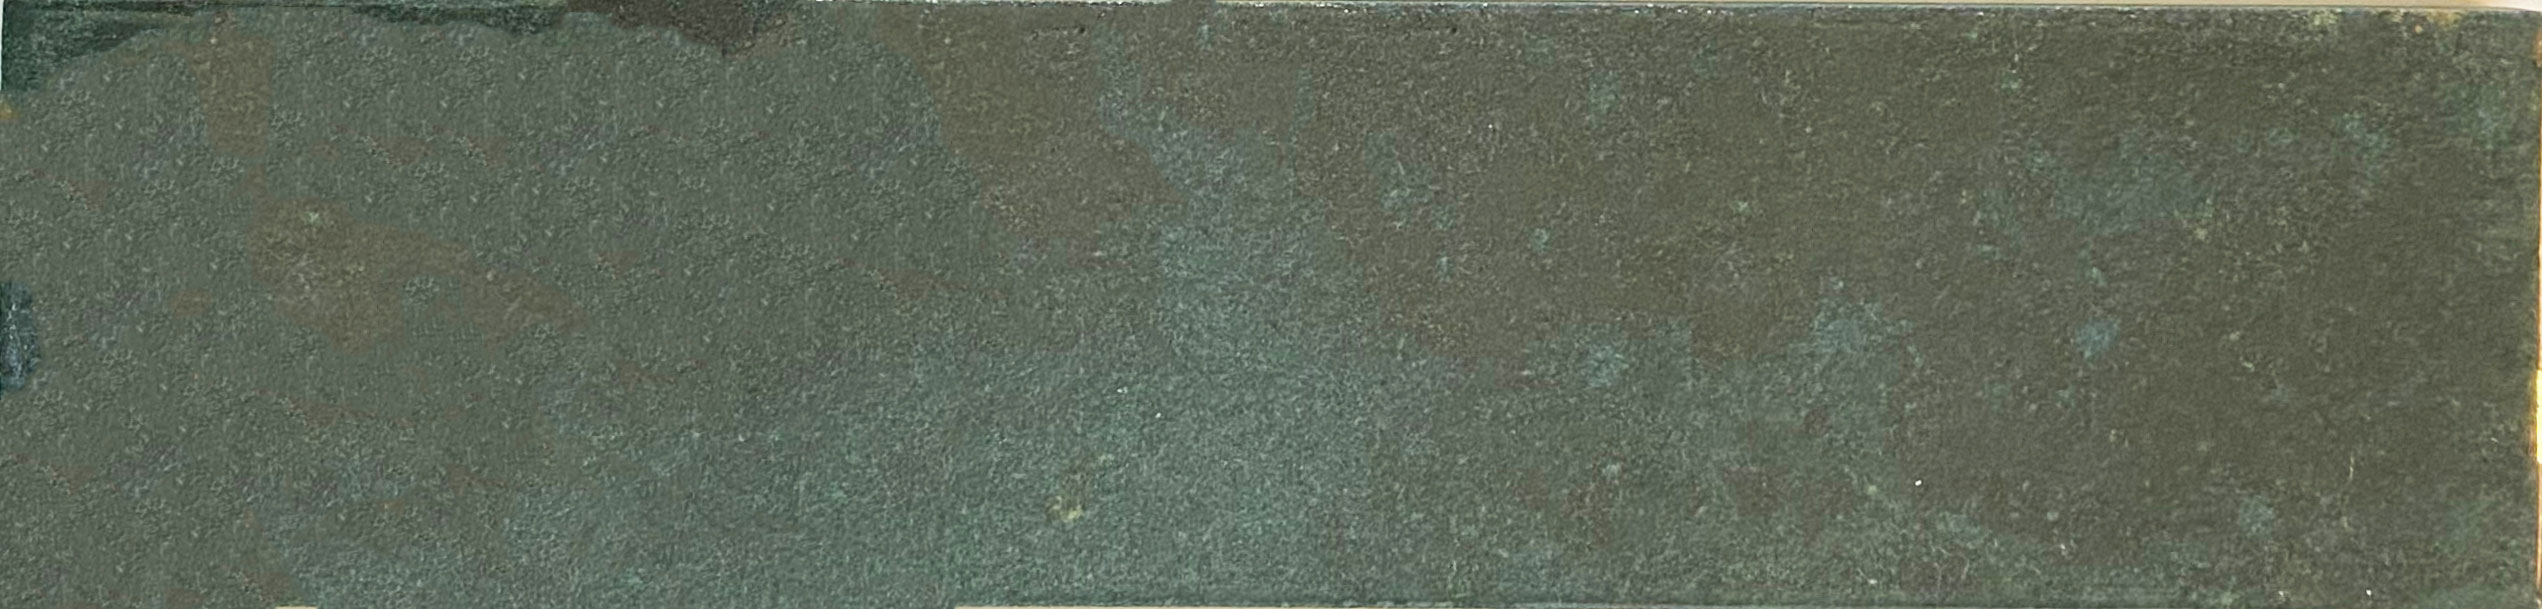 PURE BALANCE Bricks patina Image